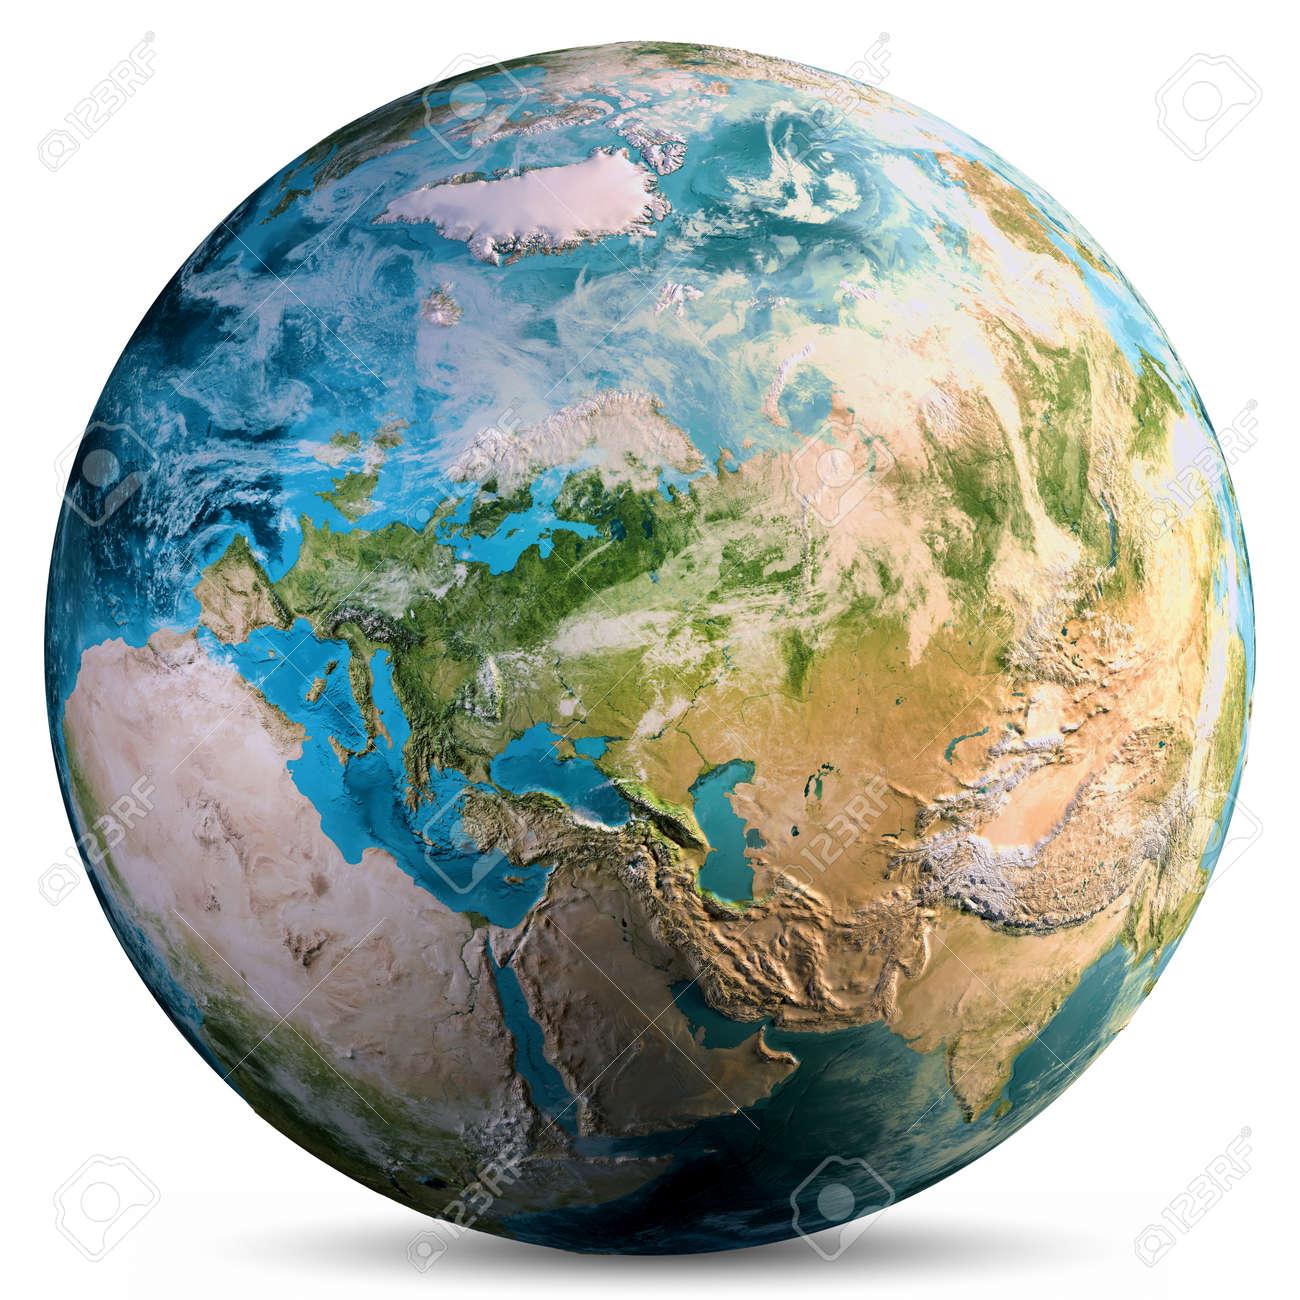 Planet Earth world. - 121762331